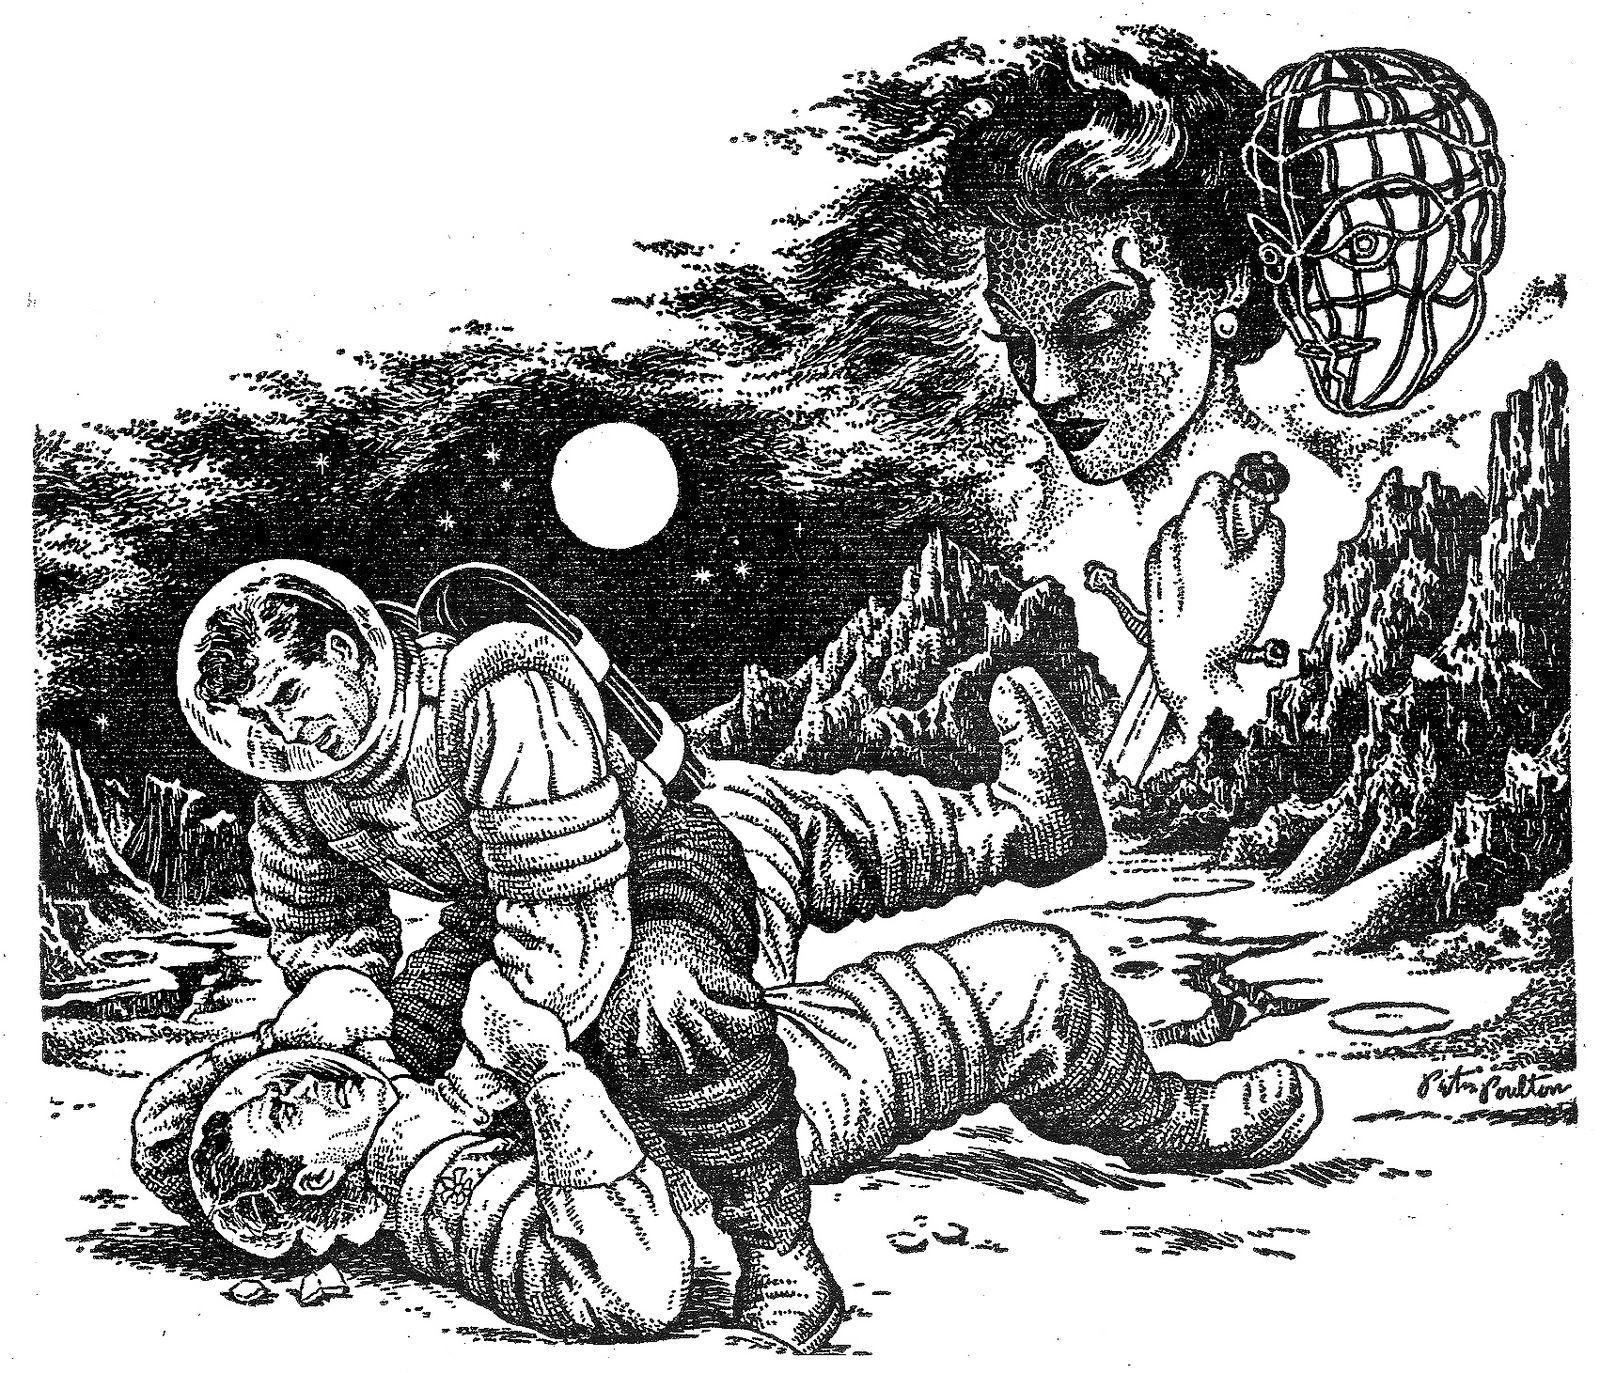 Vintage Sci Fi Illustrations Retro Science Fiction: This Vintage Science Fiction Magazine Art Is Worth Geeking